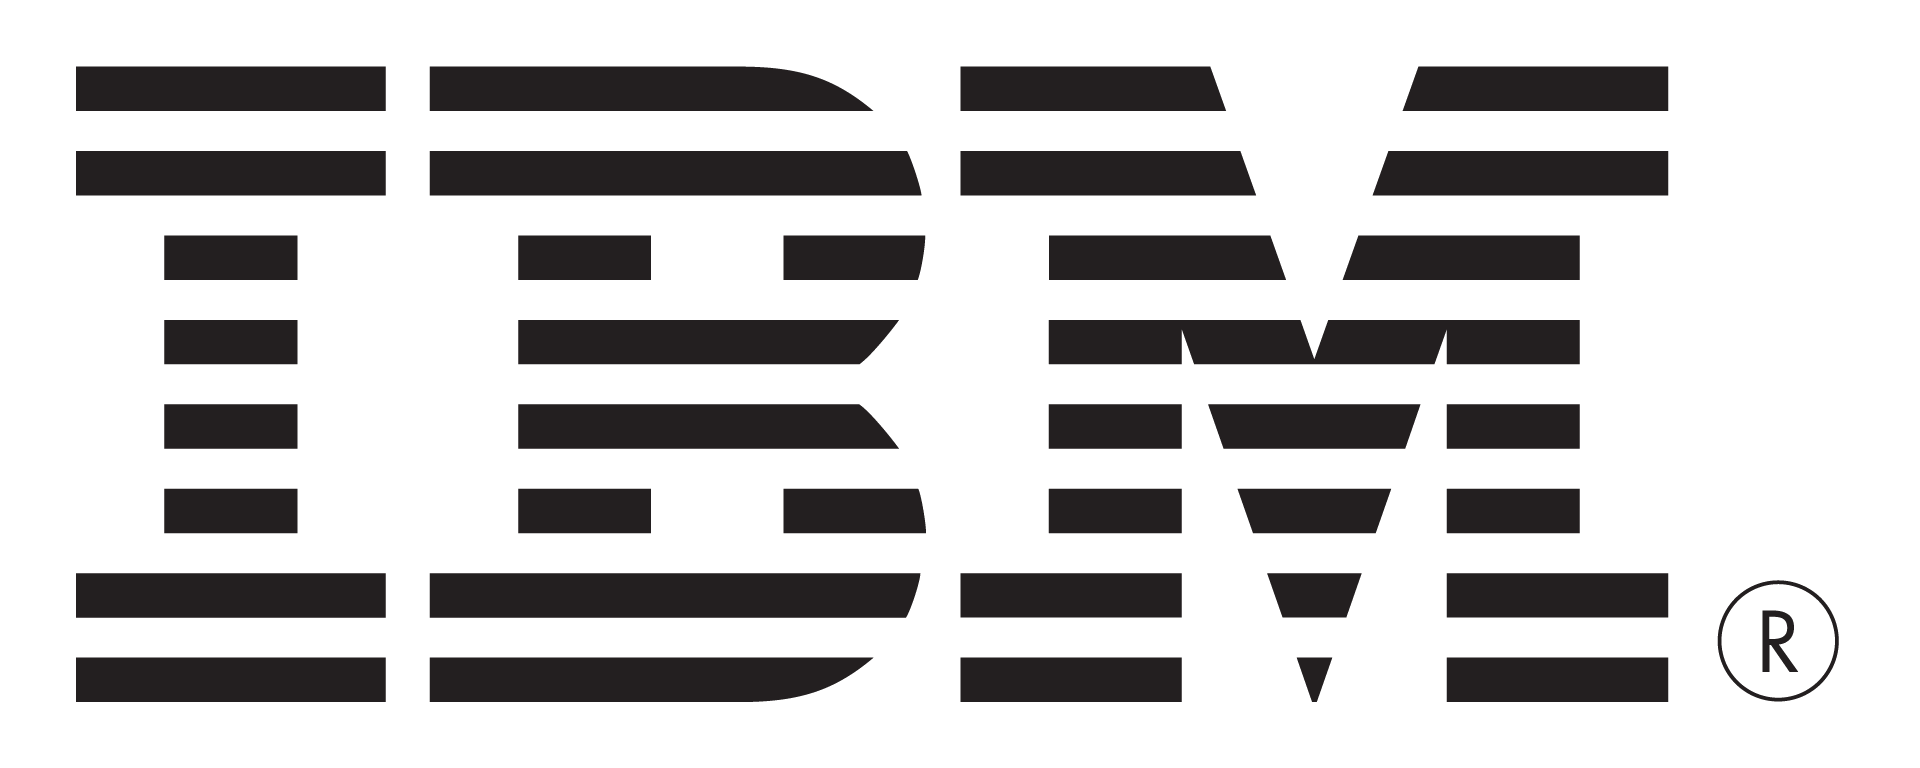 IBM Watson Assistant logo